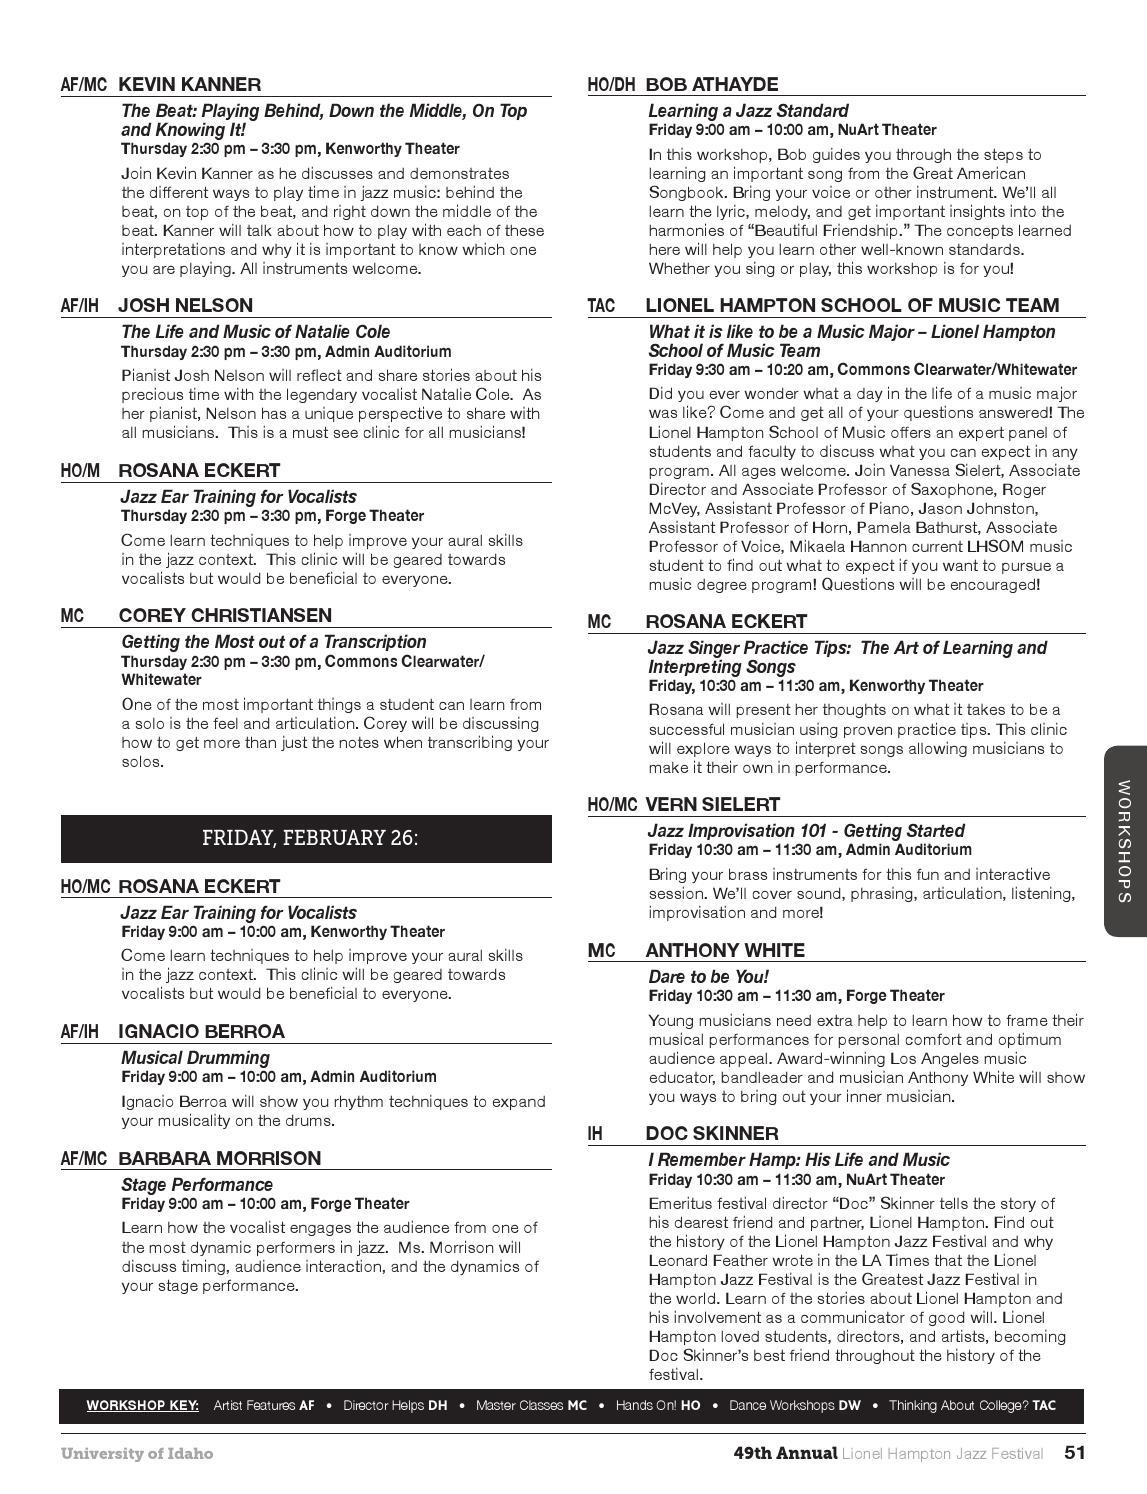 2016 Lionel Hampton Jazz Festival Program by The University